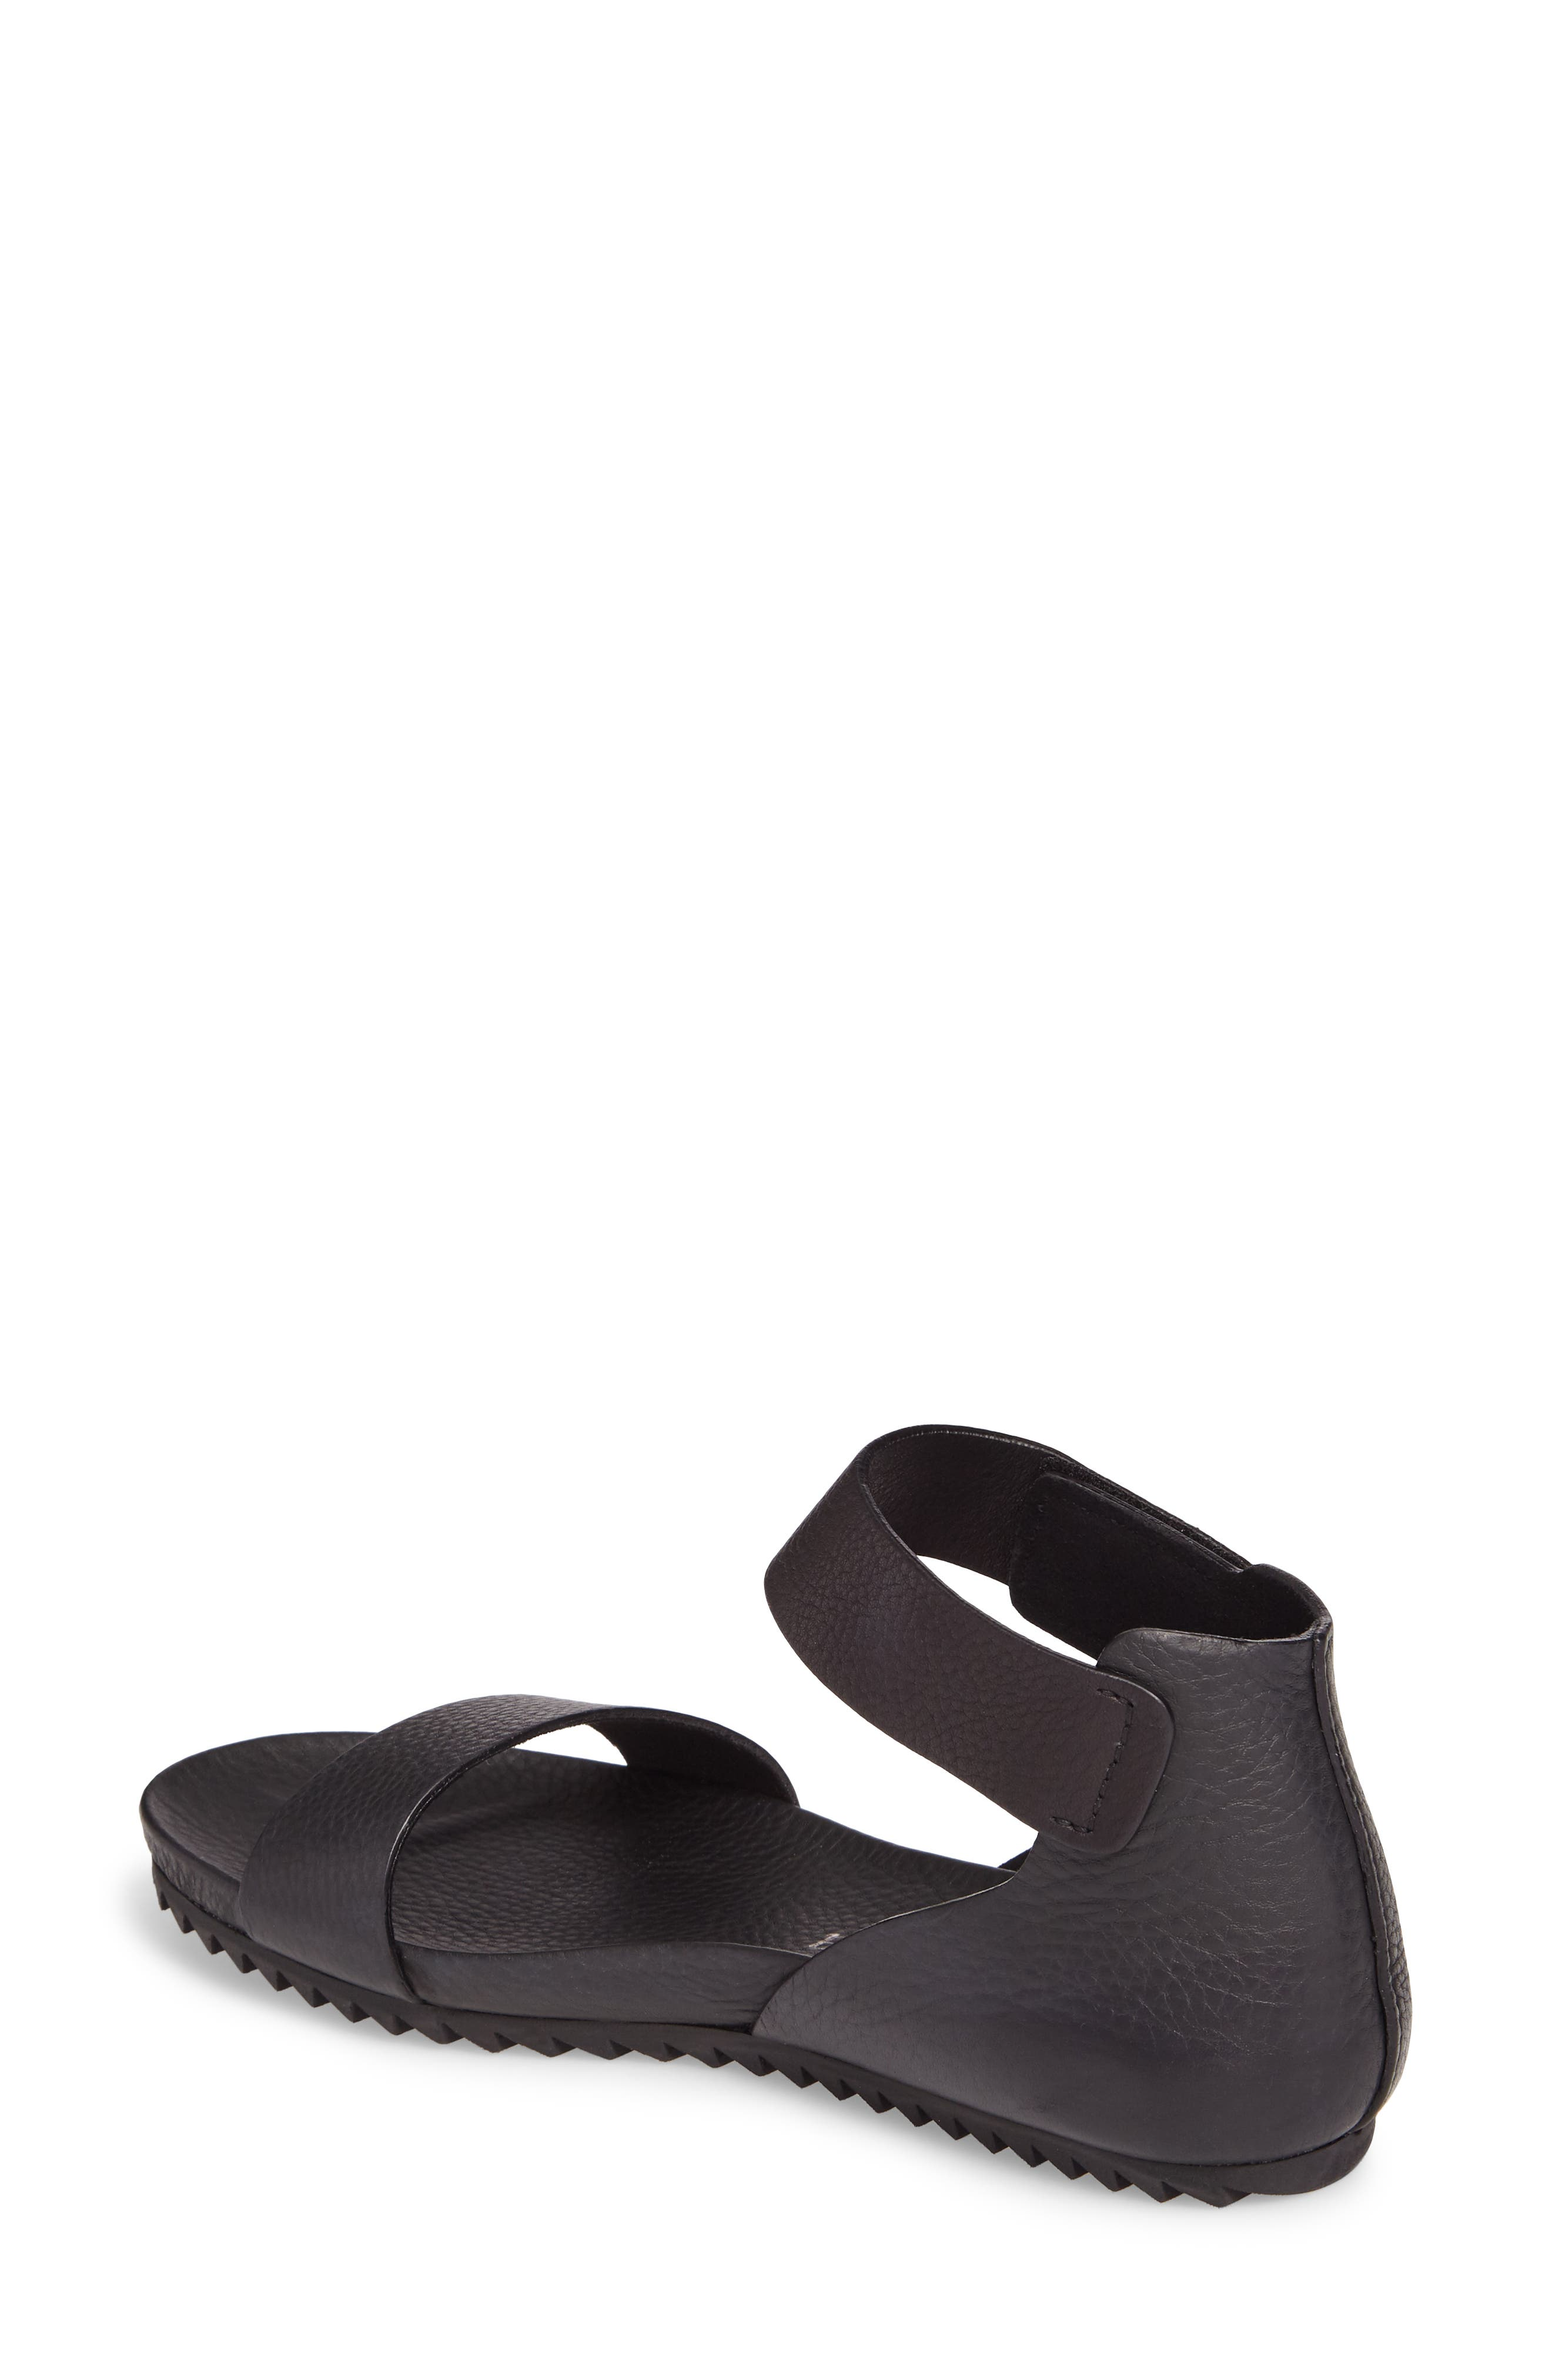 Alternate Image 2  - Pedro Garcia Jalila Ankle Strap Sandal (Women) (Nordstrom Exclusive)